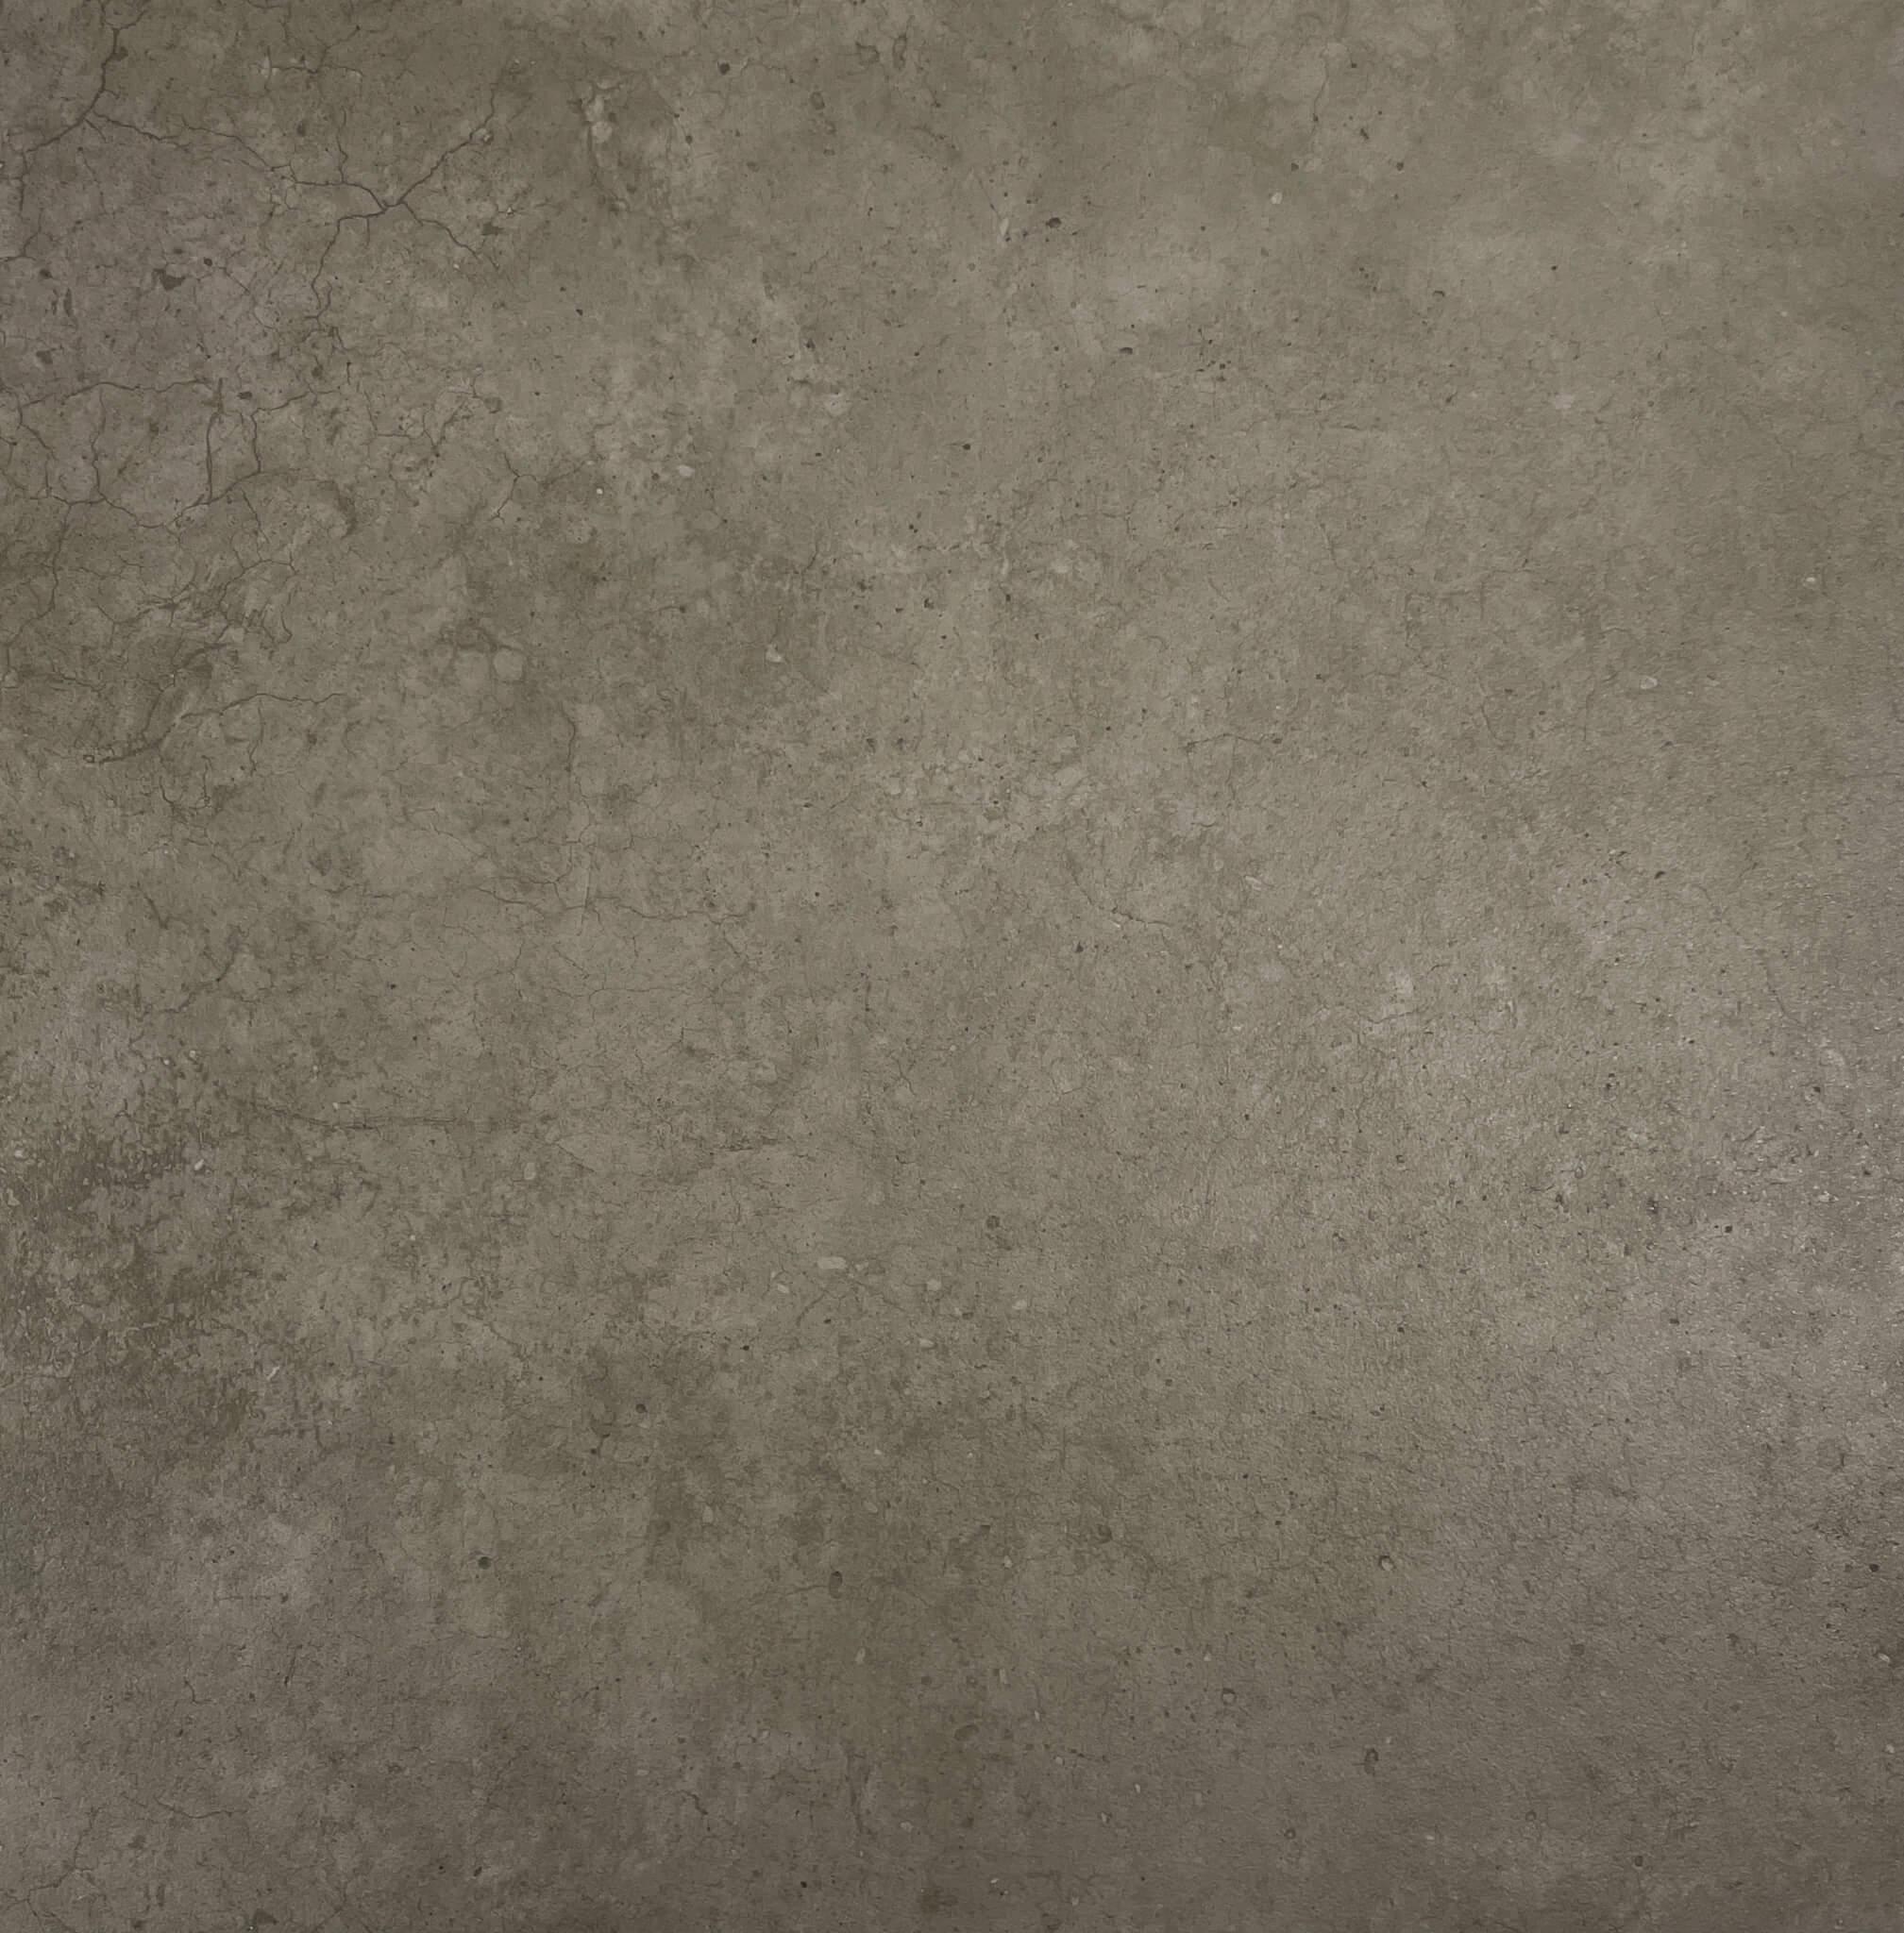 Industrial Mud Concrete Look Matt Finish Rectified Italian Porcelain Tile 3917